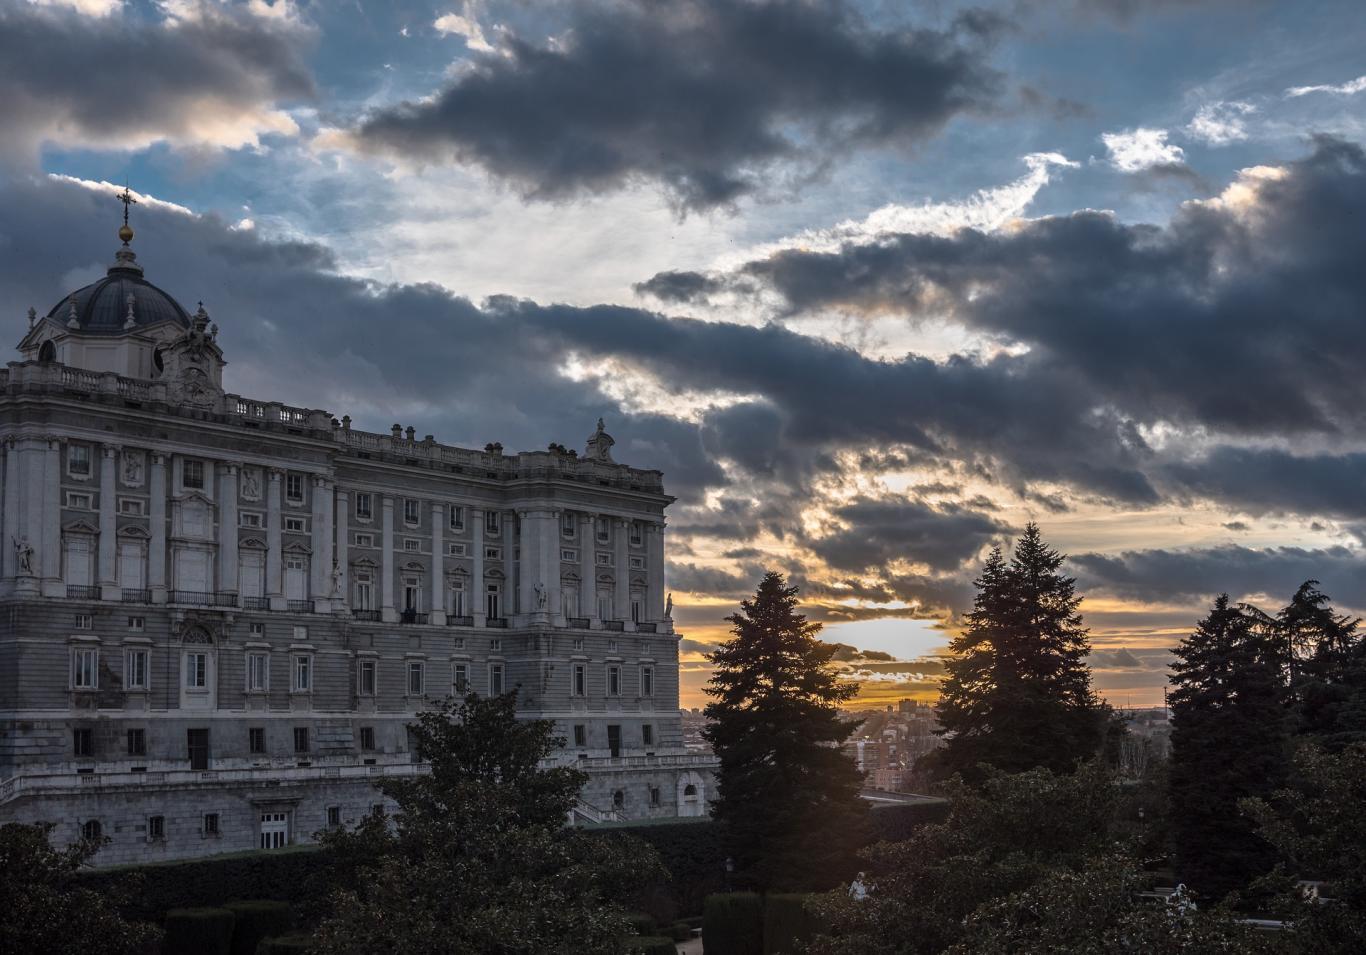 Madrid.Palacio real